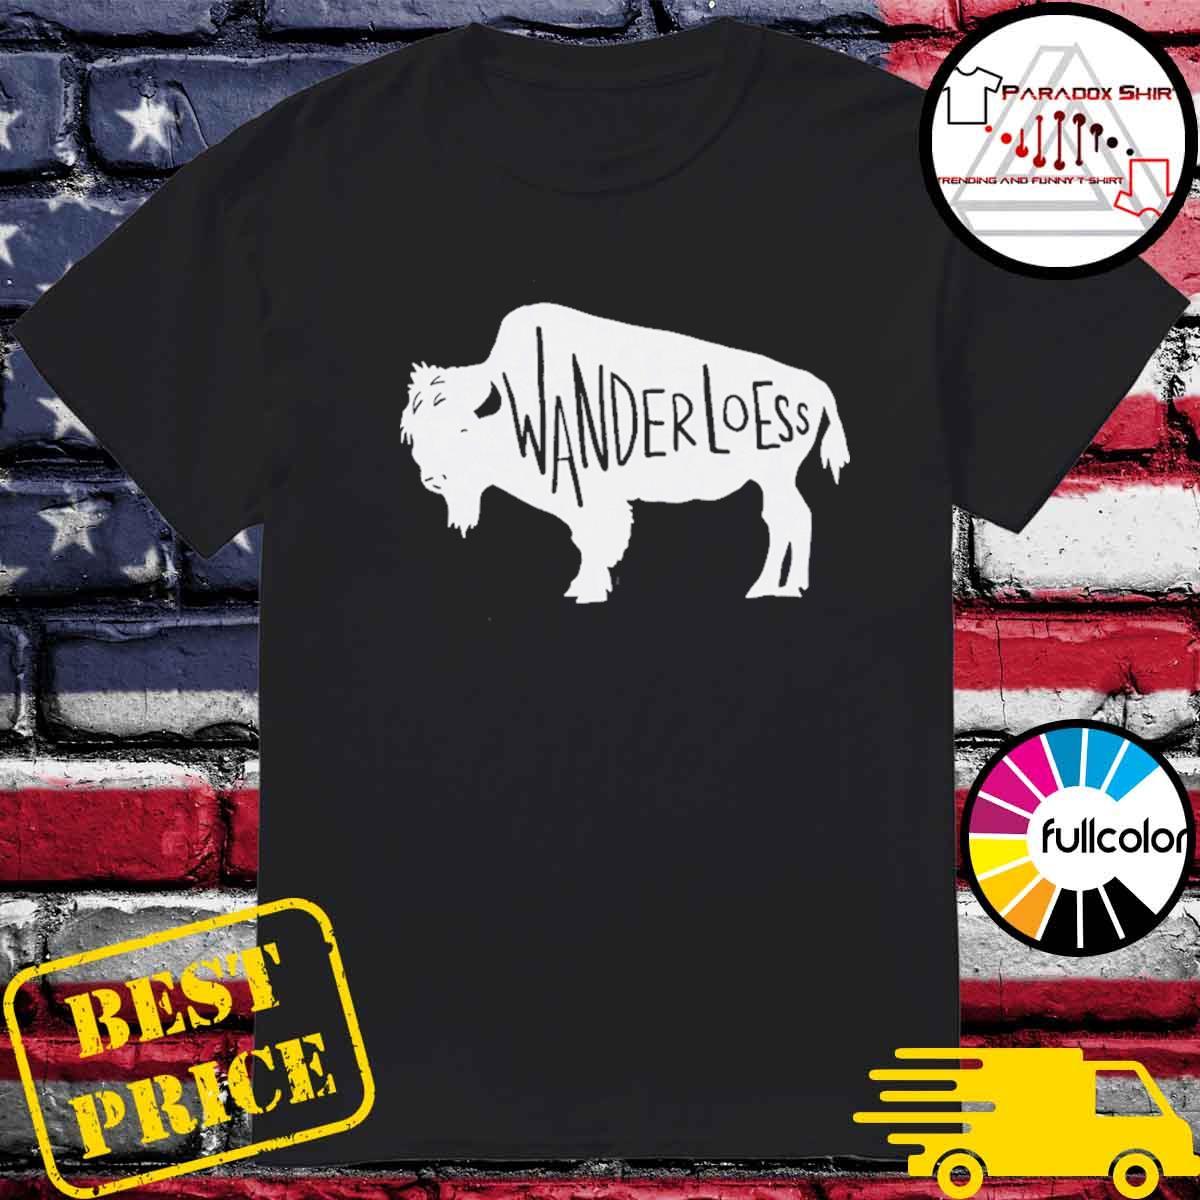 Wanderloess shirt